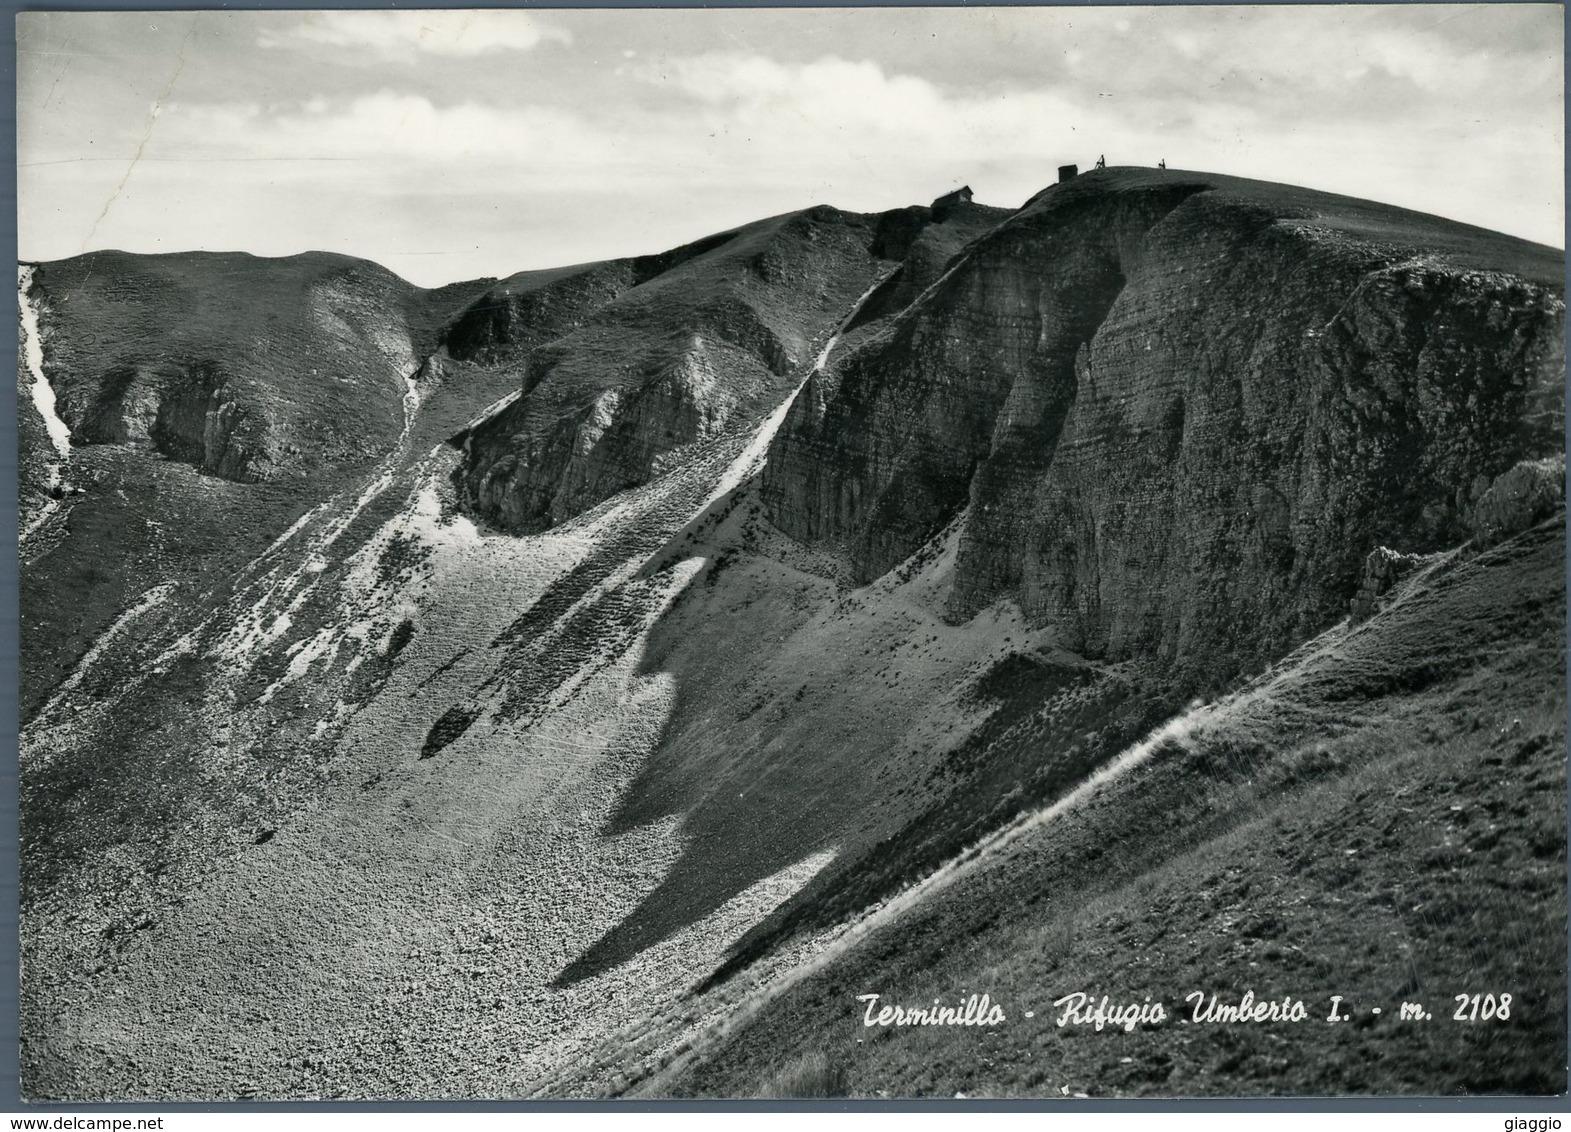 °°° Cartolina N. 24 Terminillo Rifugio Umberto I Viaggiata °°° - Rieti